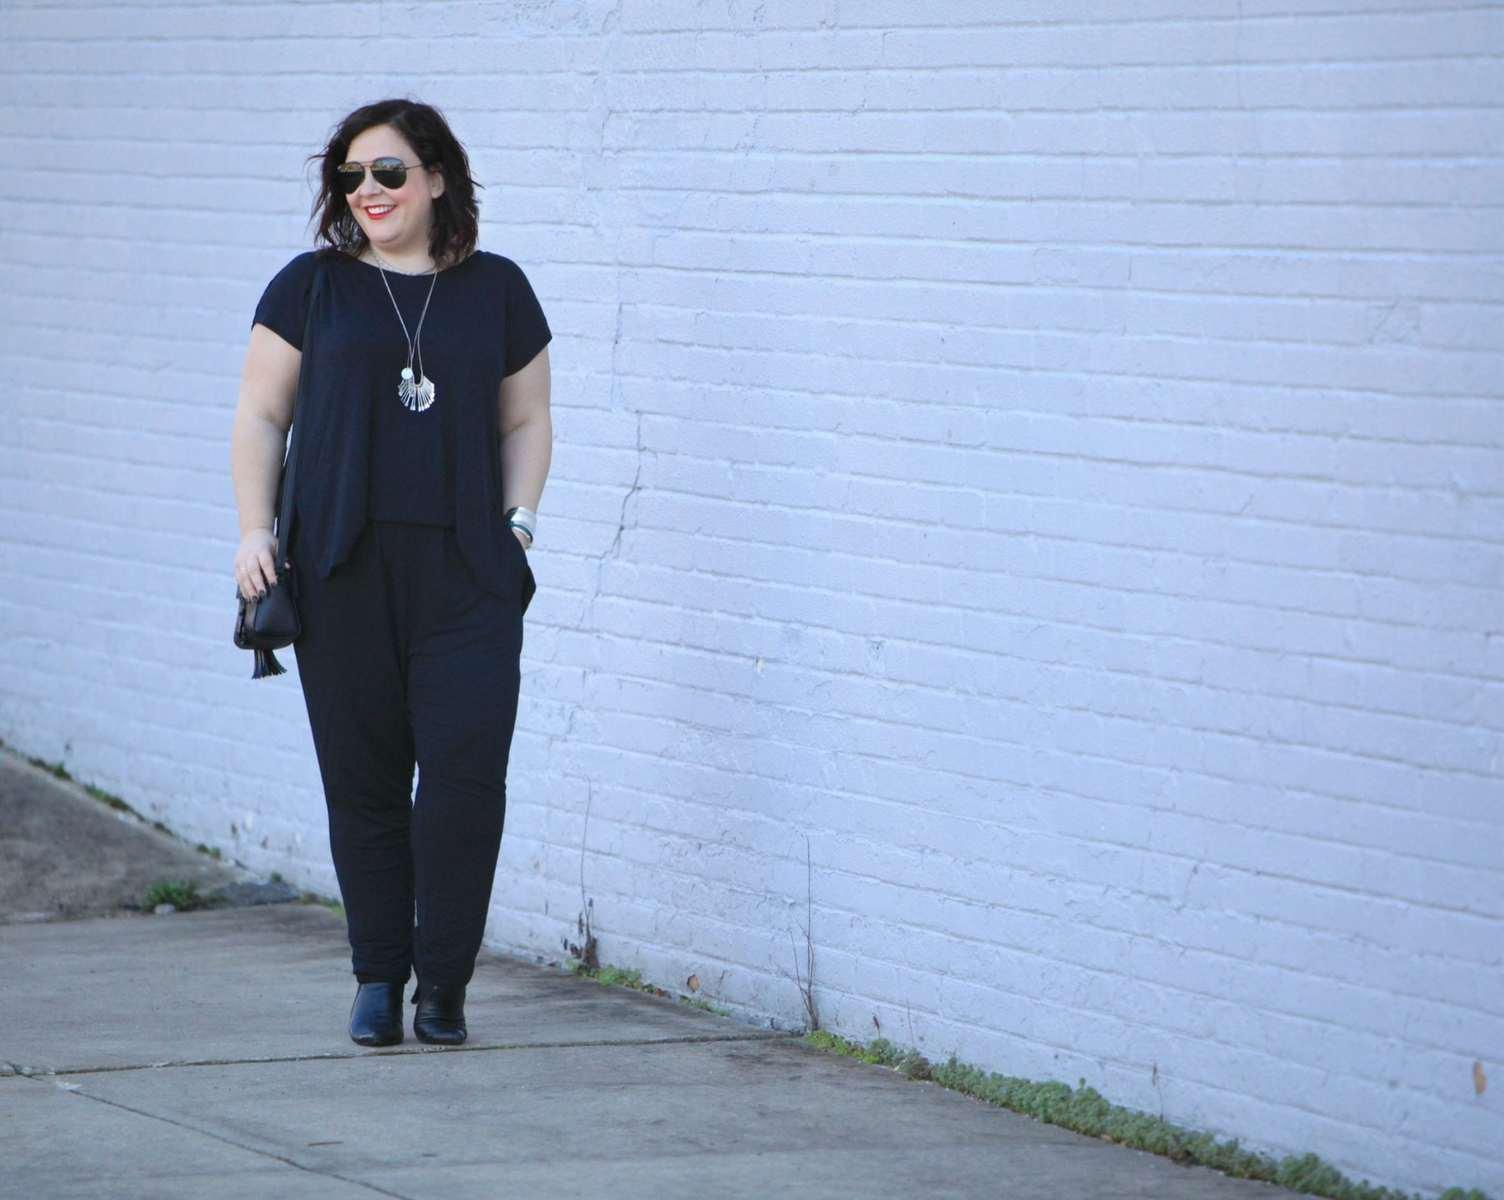 wardrobe oxygen over 40 blogger wearing cabi